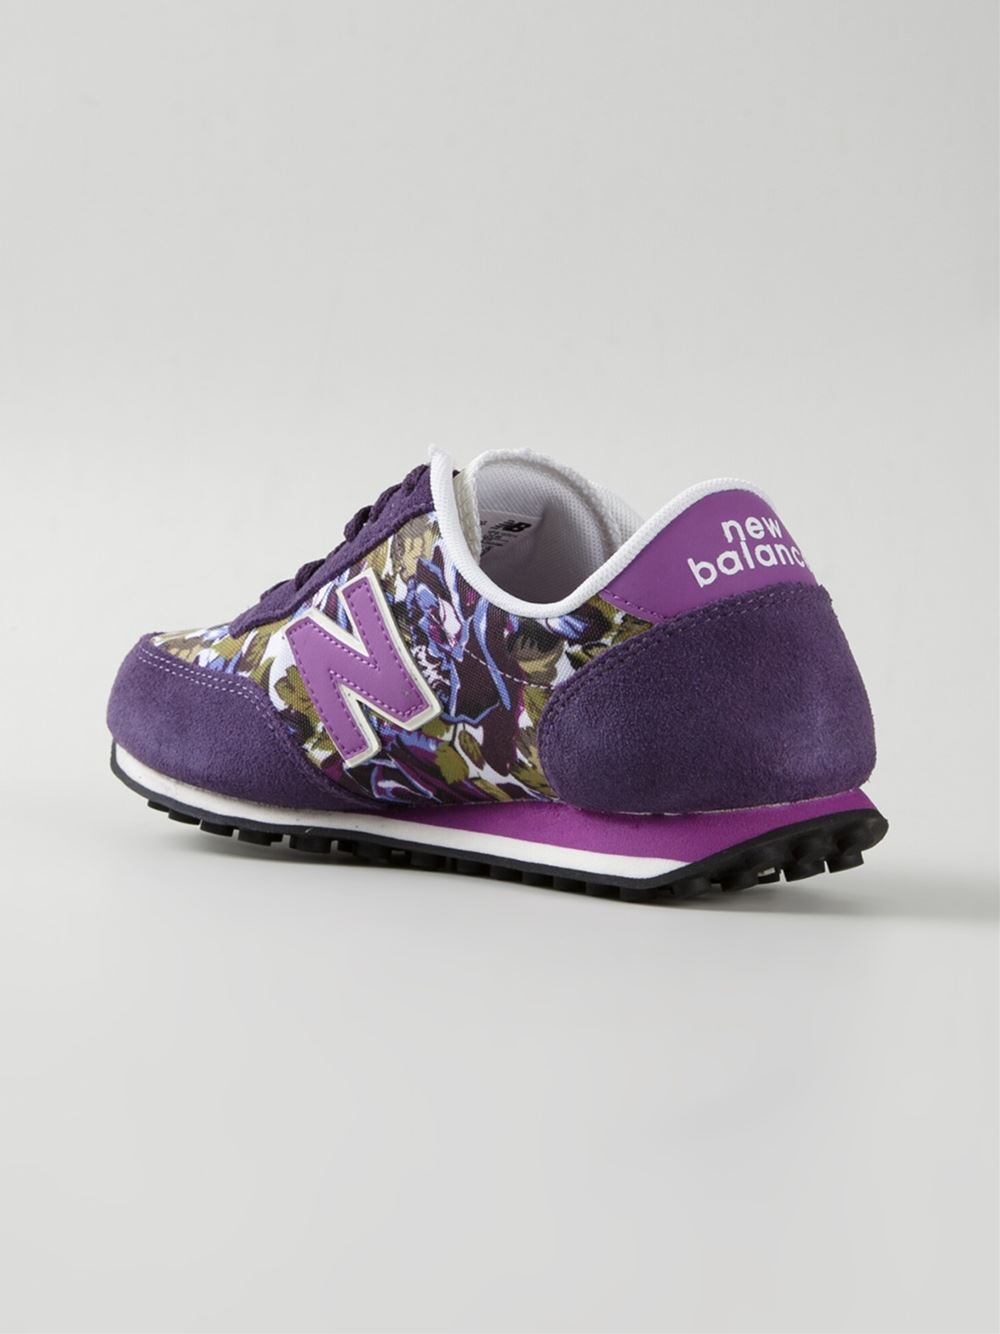 New Balance Shoes Trump